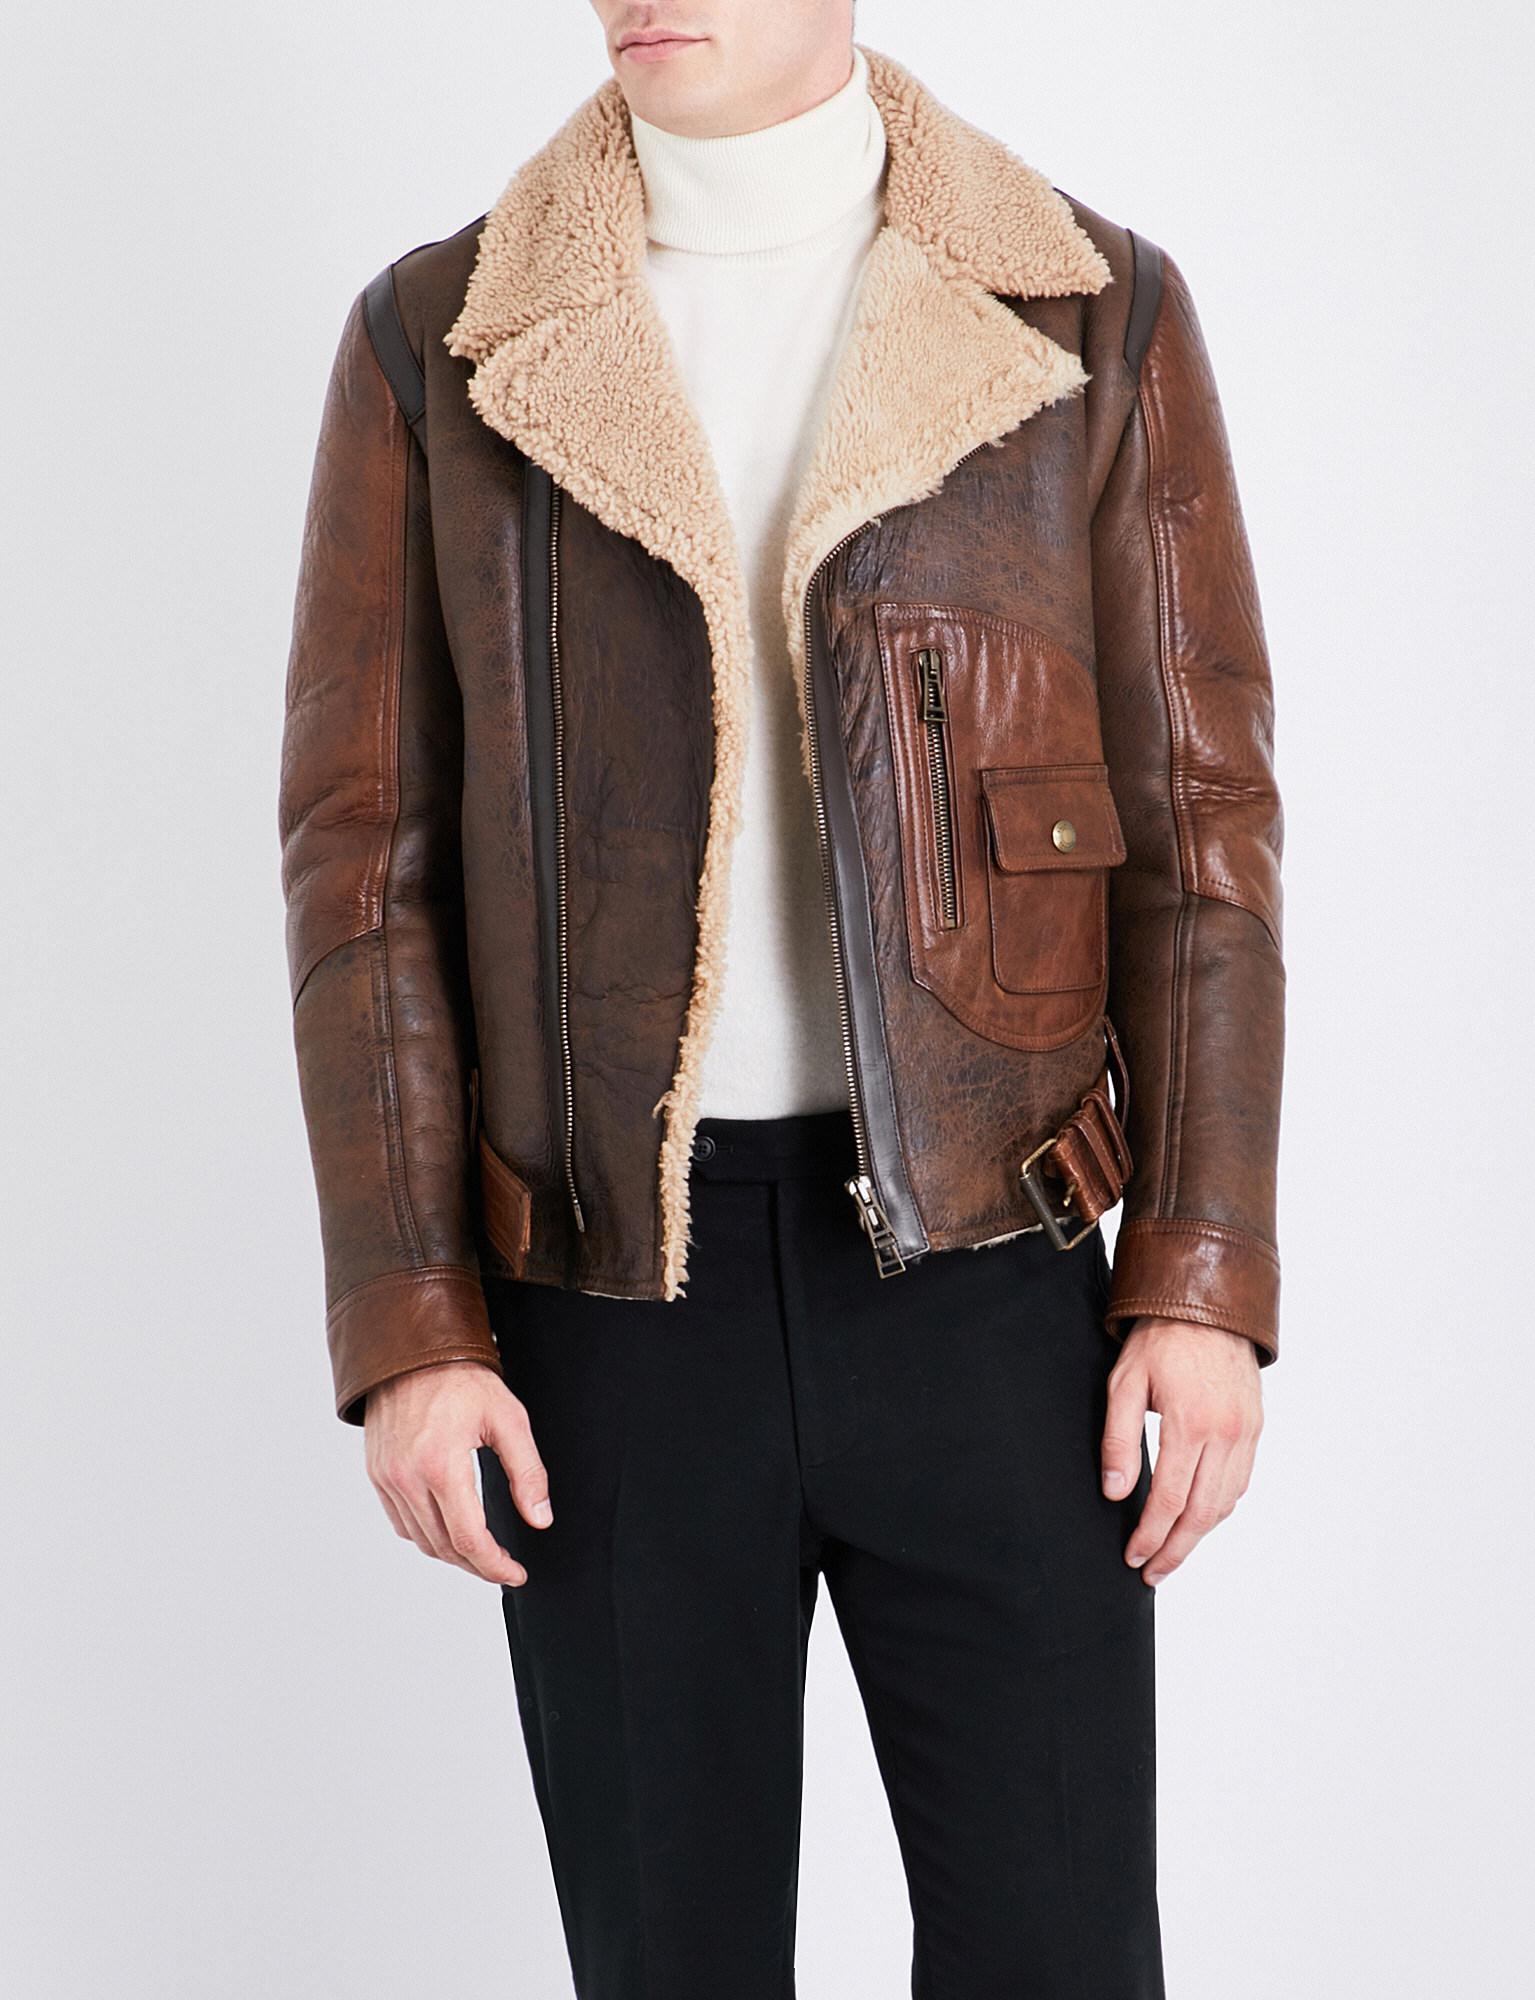 amazon outlet on sale online retailer Danescroft Shearling Leather Jacket